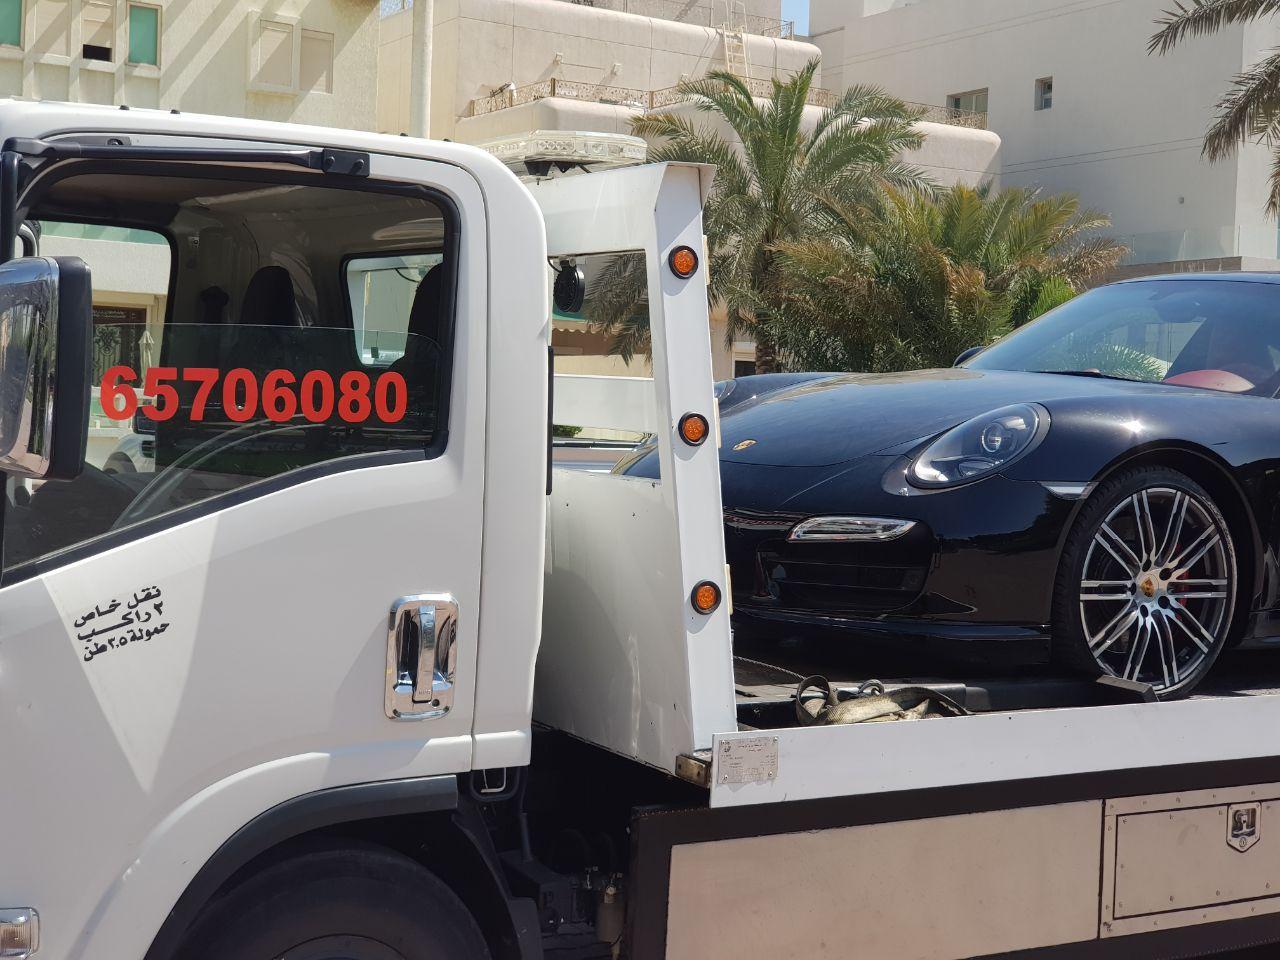 Kuwait Towing Service - 65706080 – Towing Kuwait KW